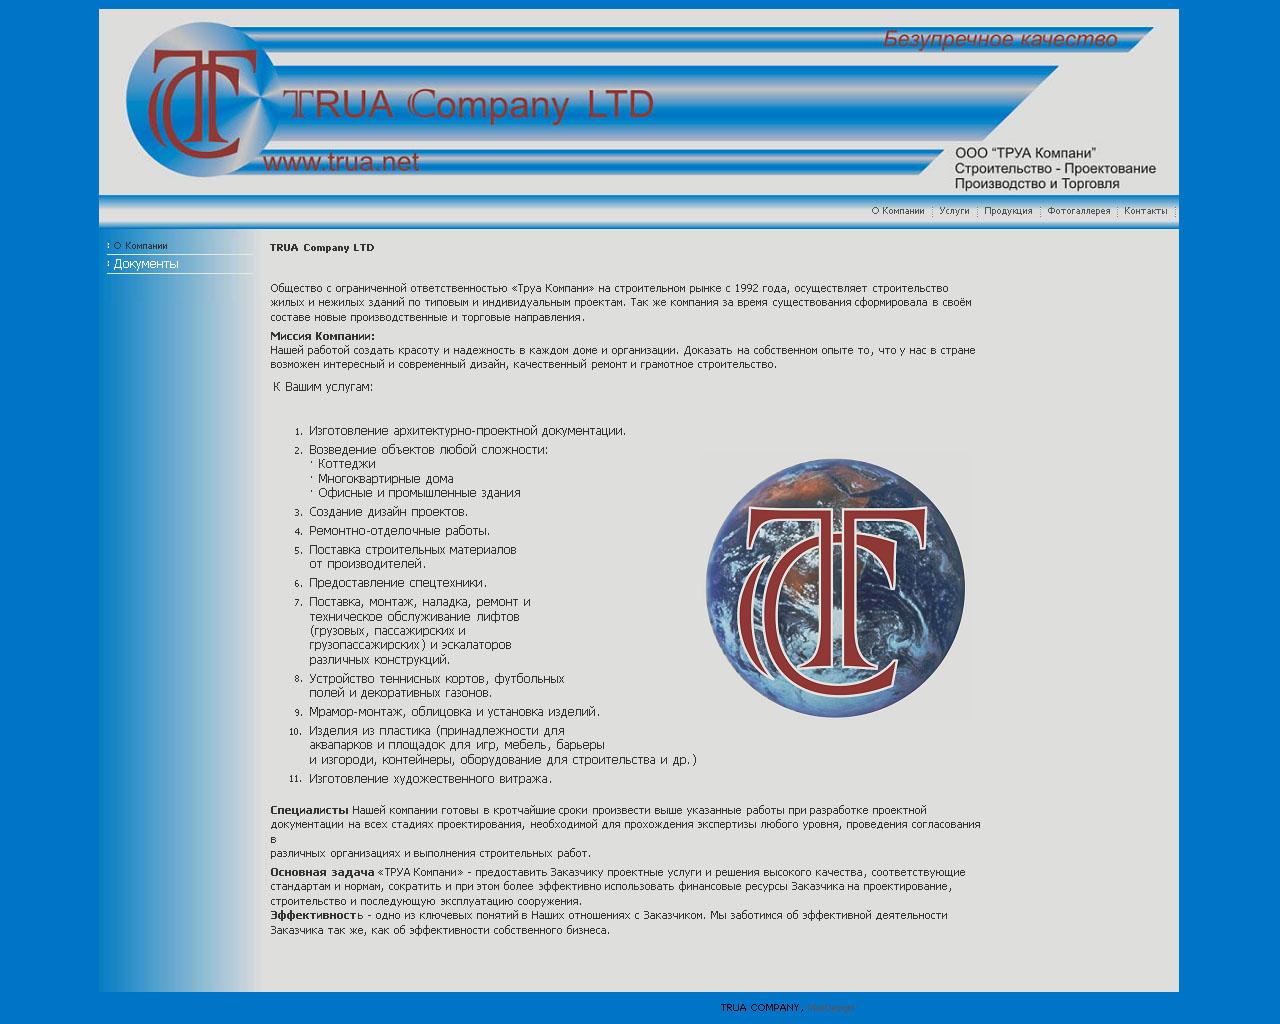 TRUA Company LTD